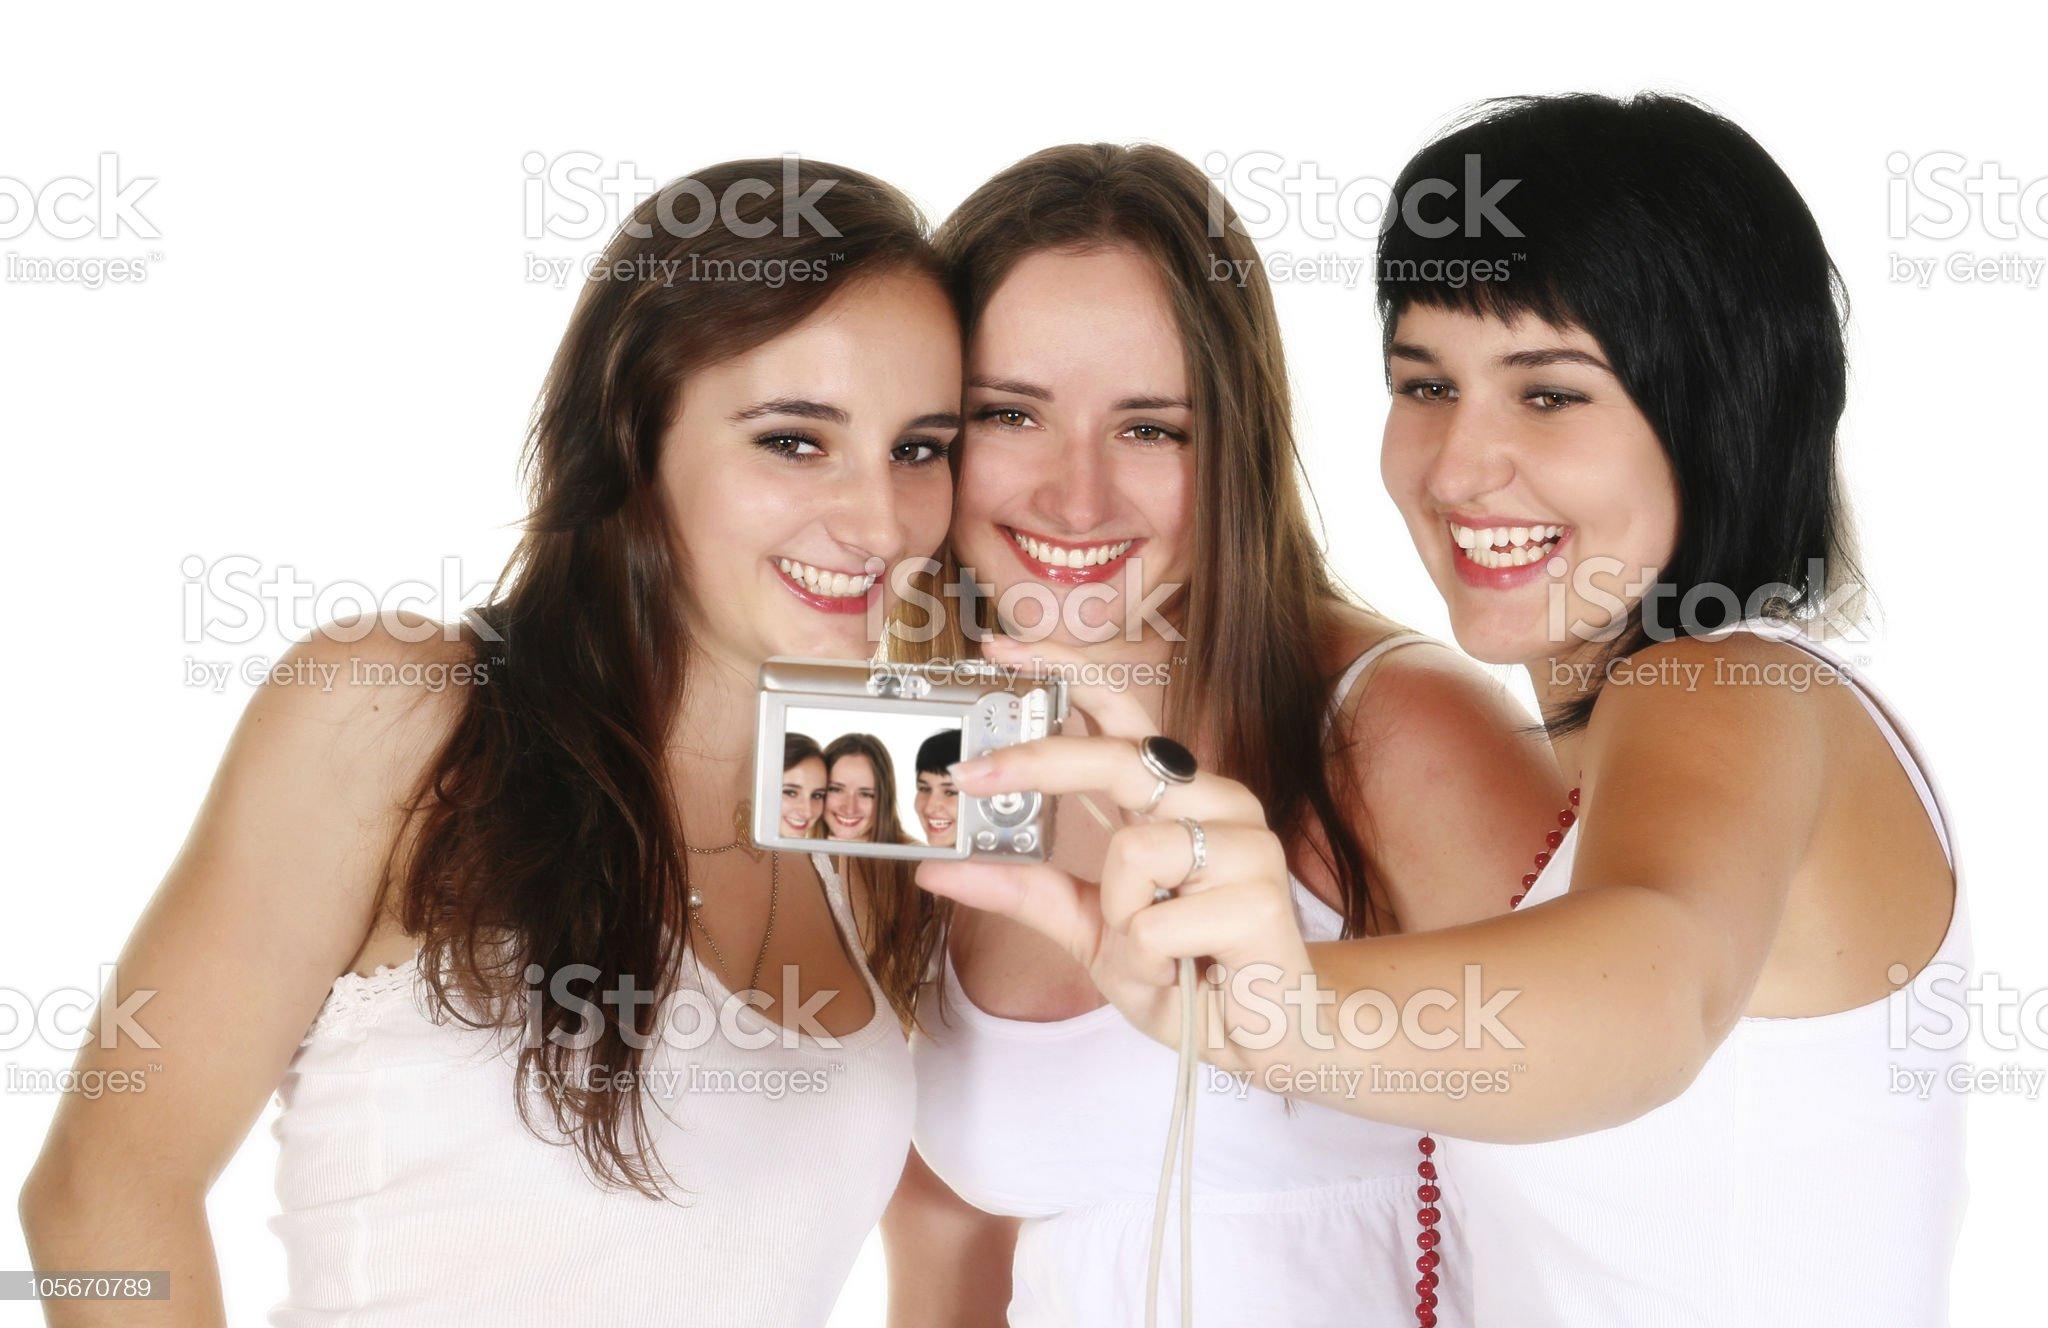 Three beautiful girls taking a photo royalty-free stock photo